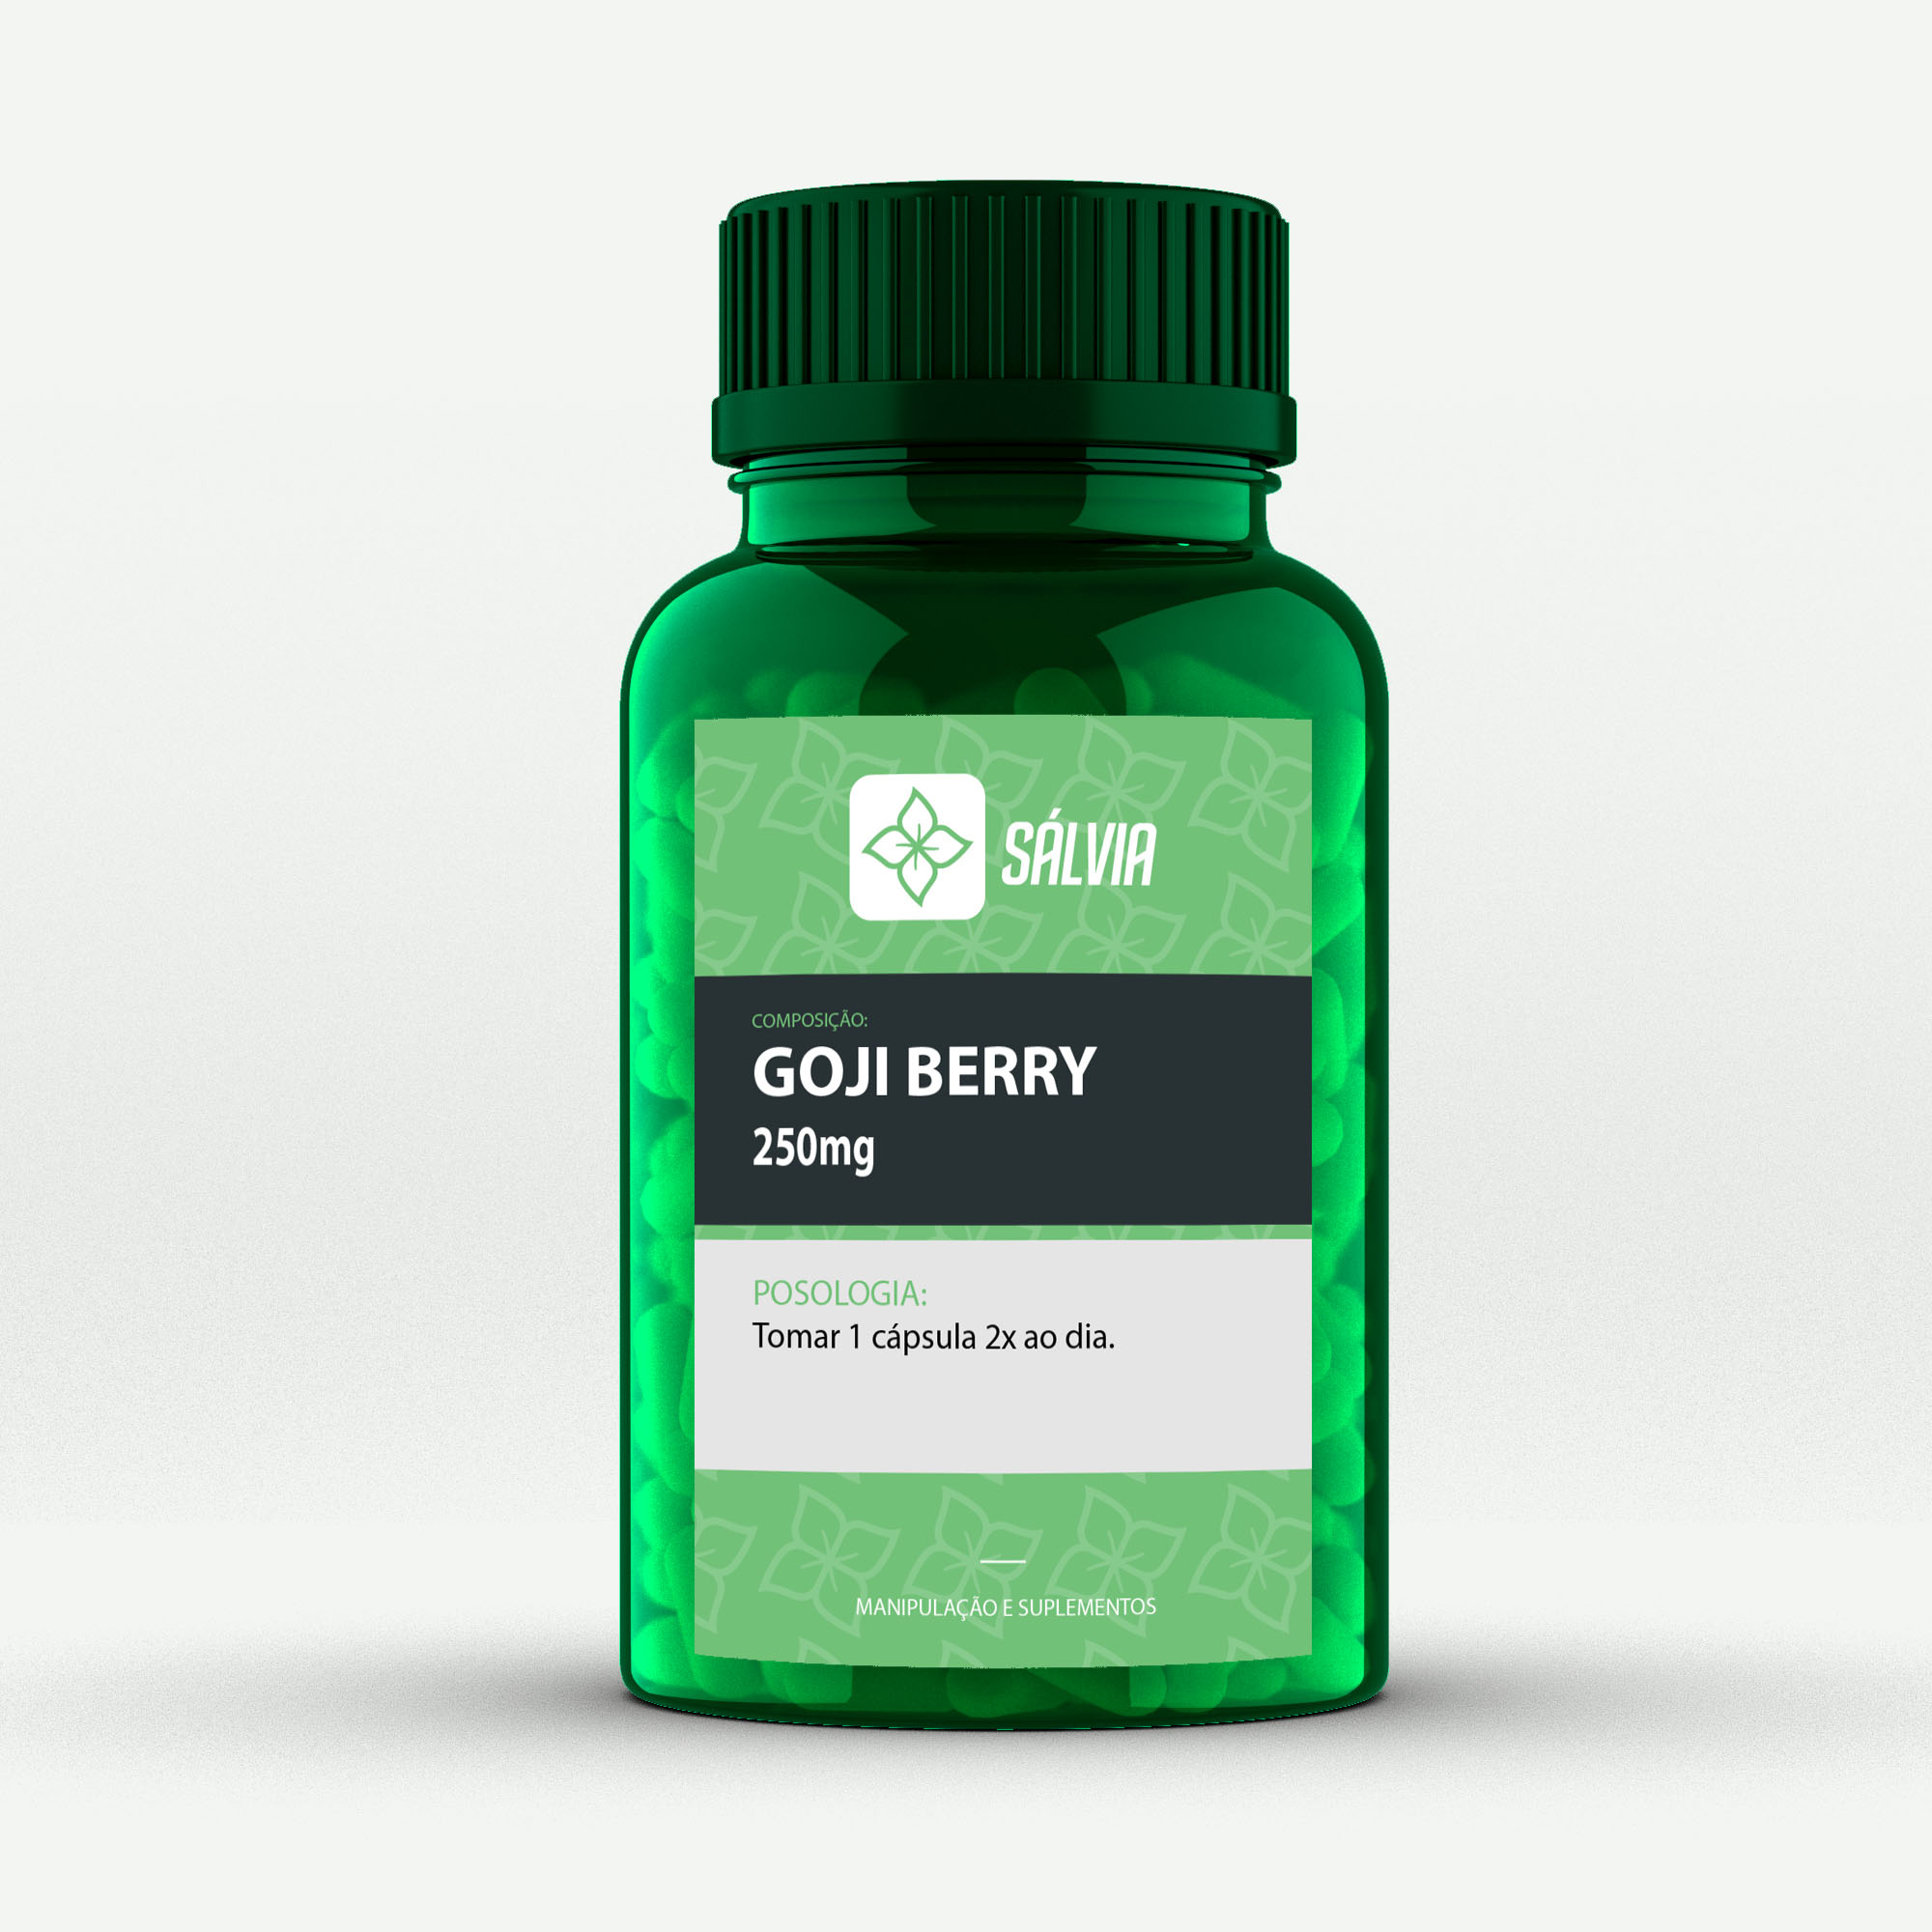 GOJI BERRY 250mg - Cápsulas